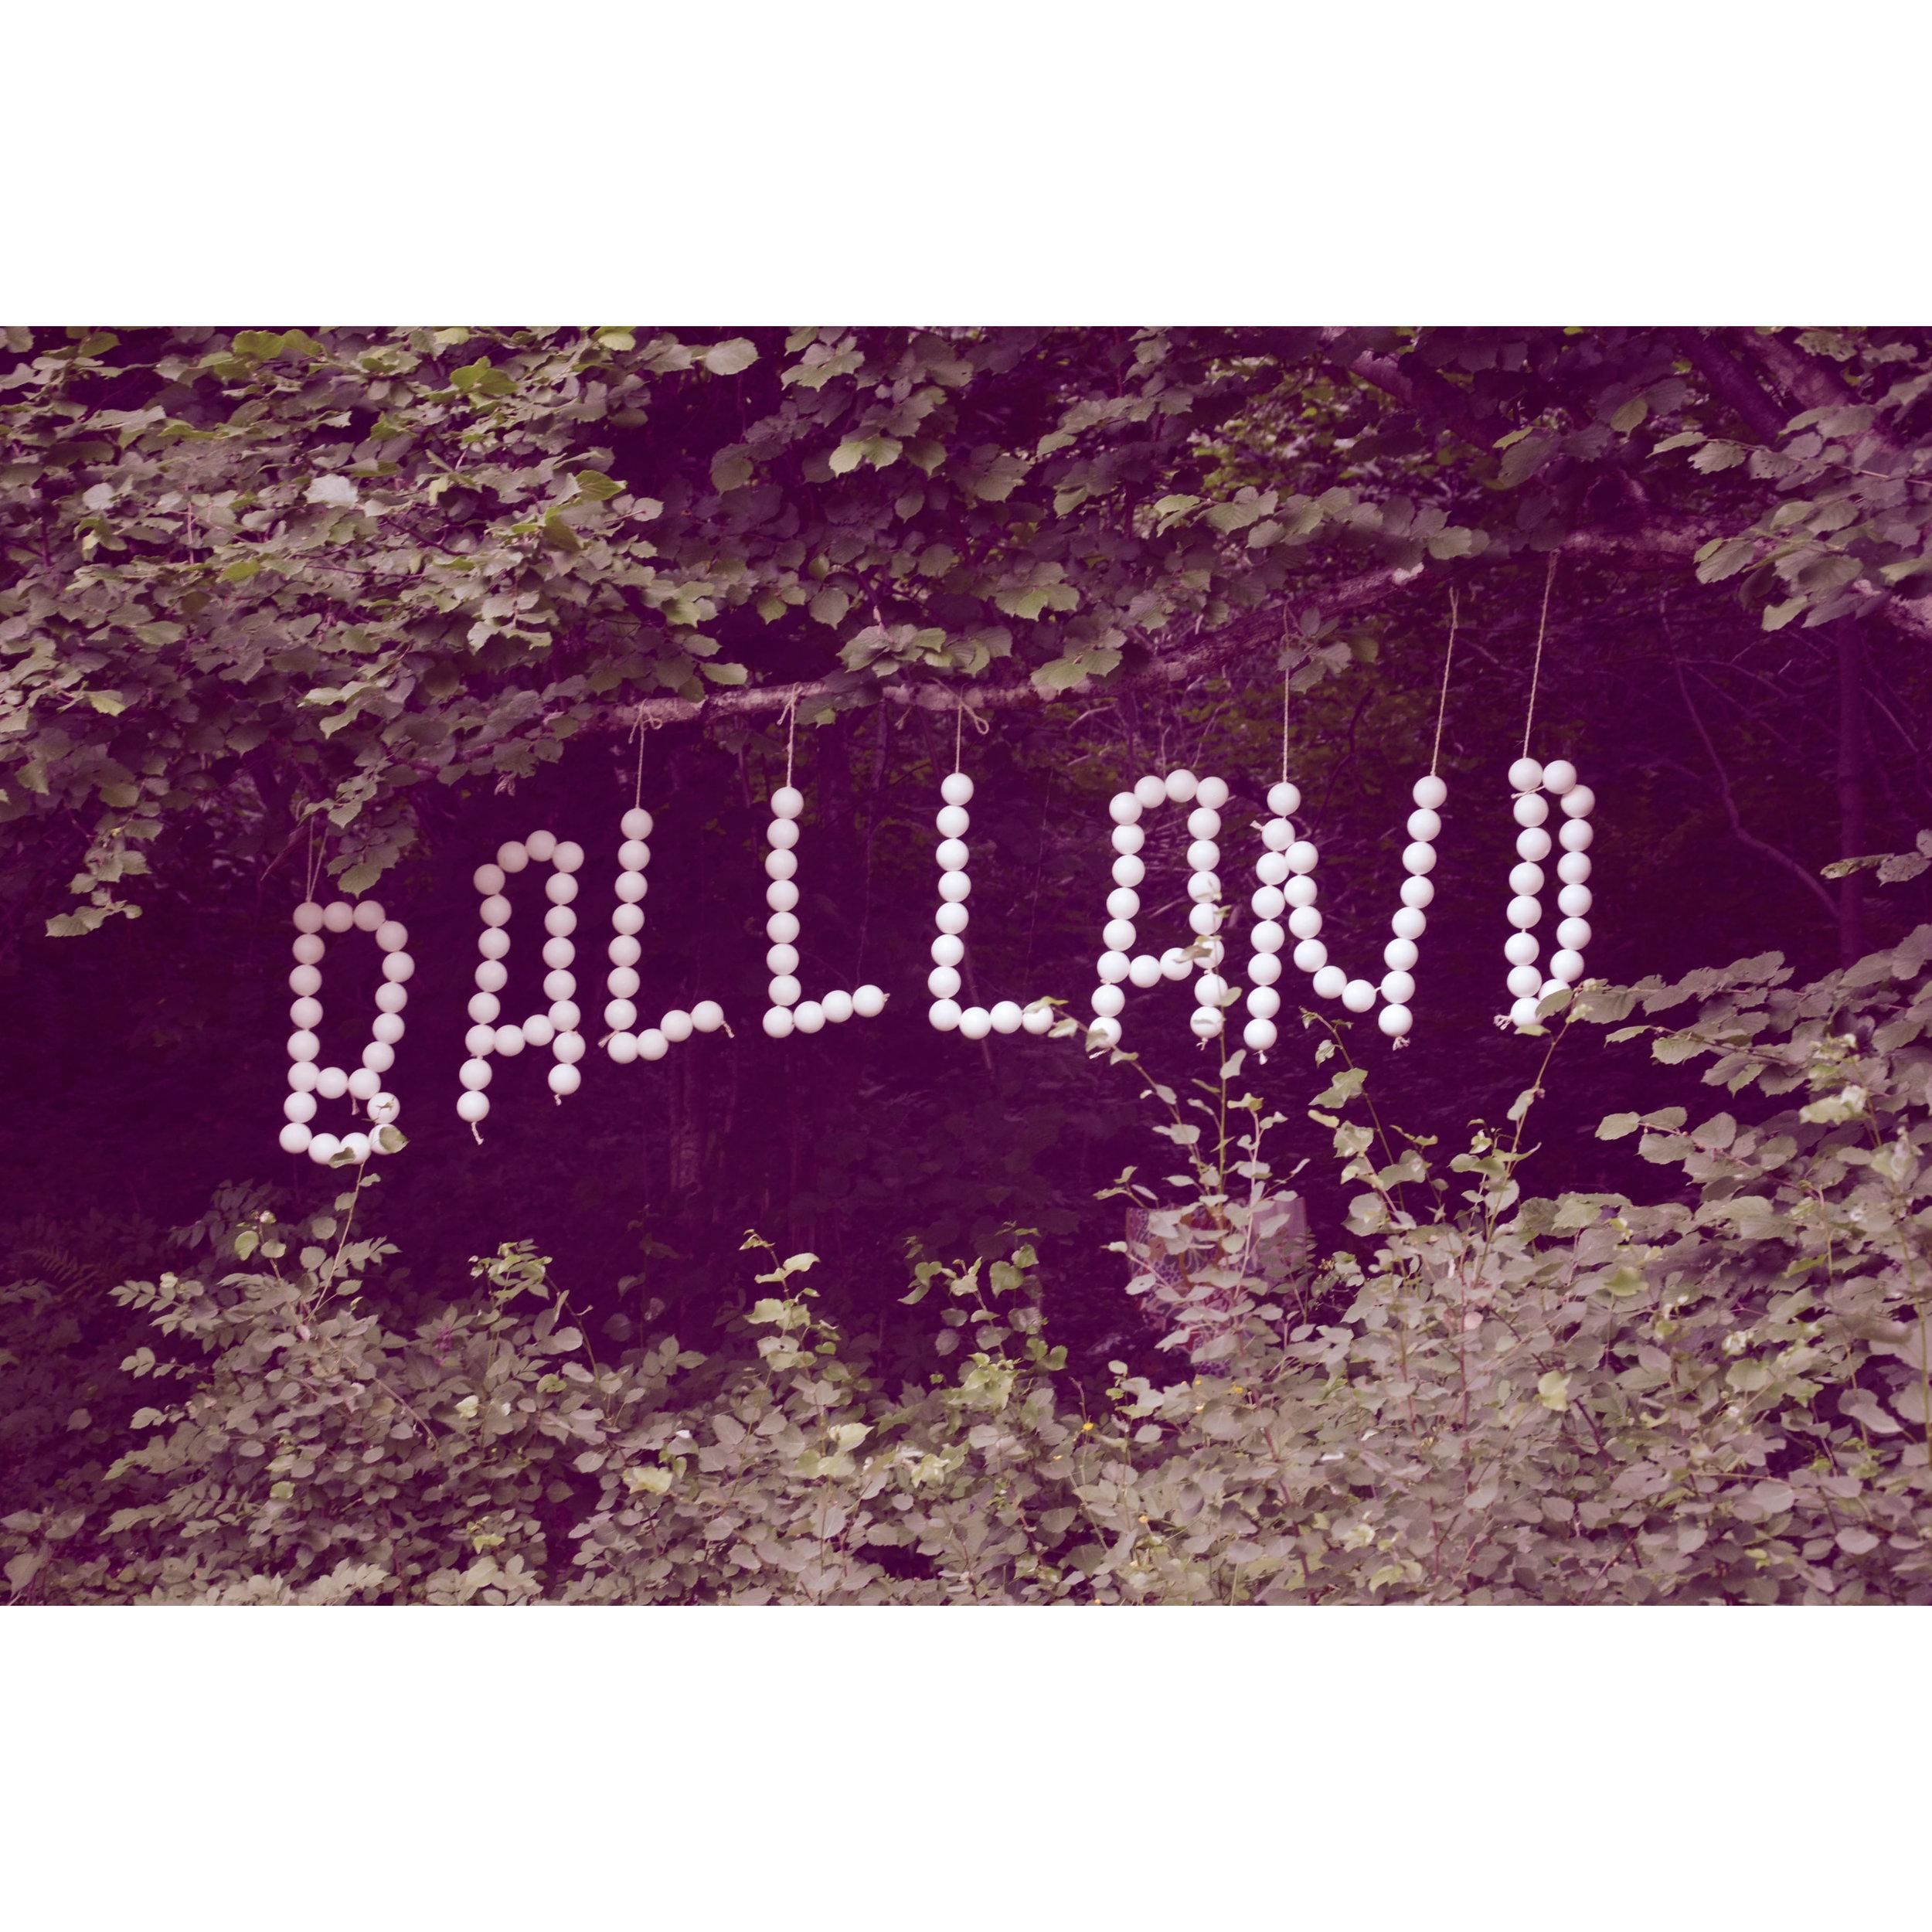 Ballland 1.jpg